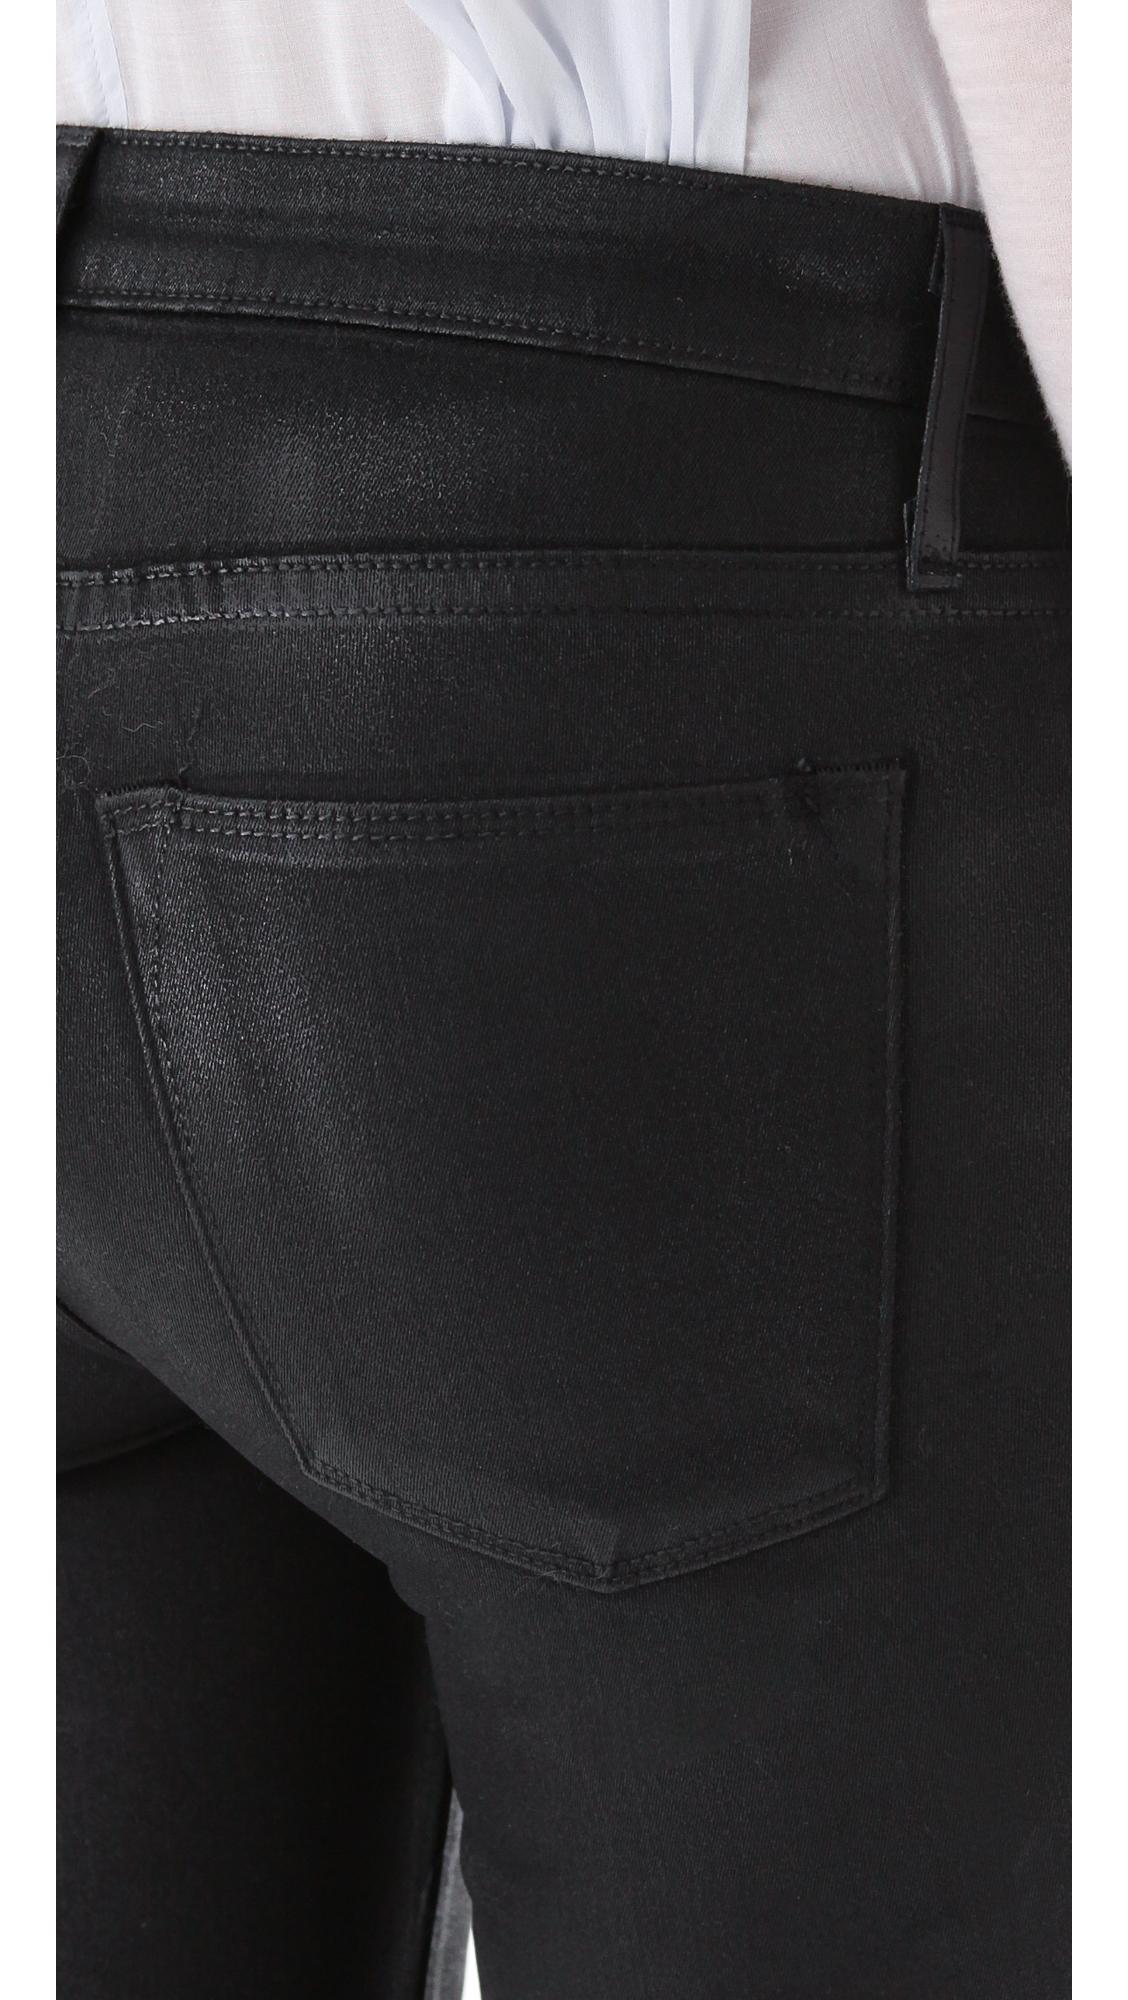 Helmut High Gloss Skinny Jeans Black in Black   Lyst